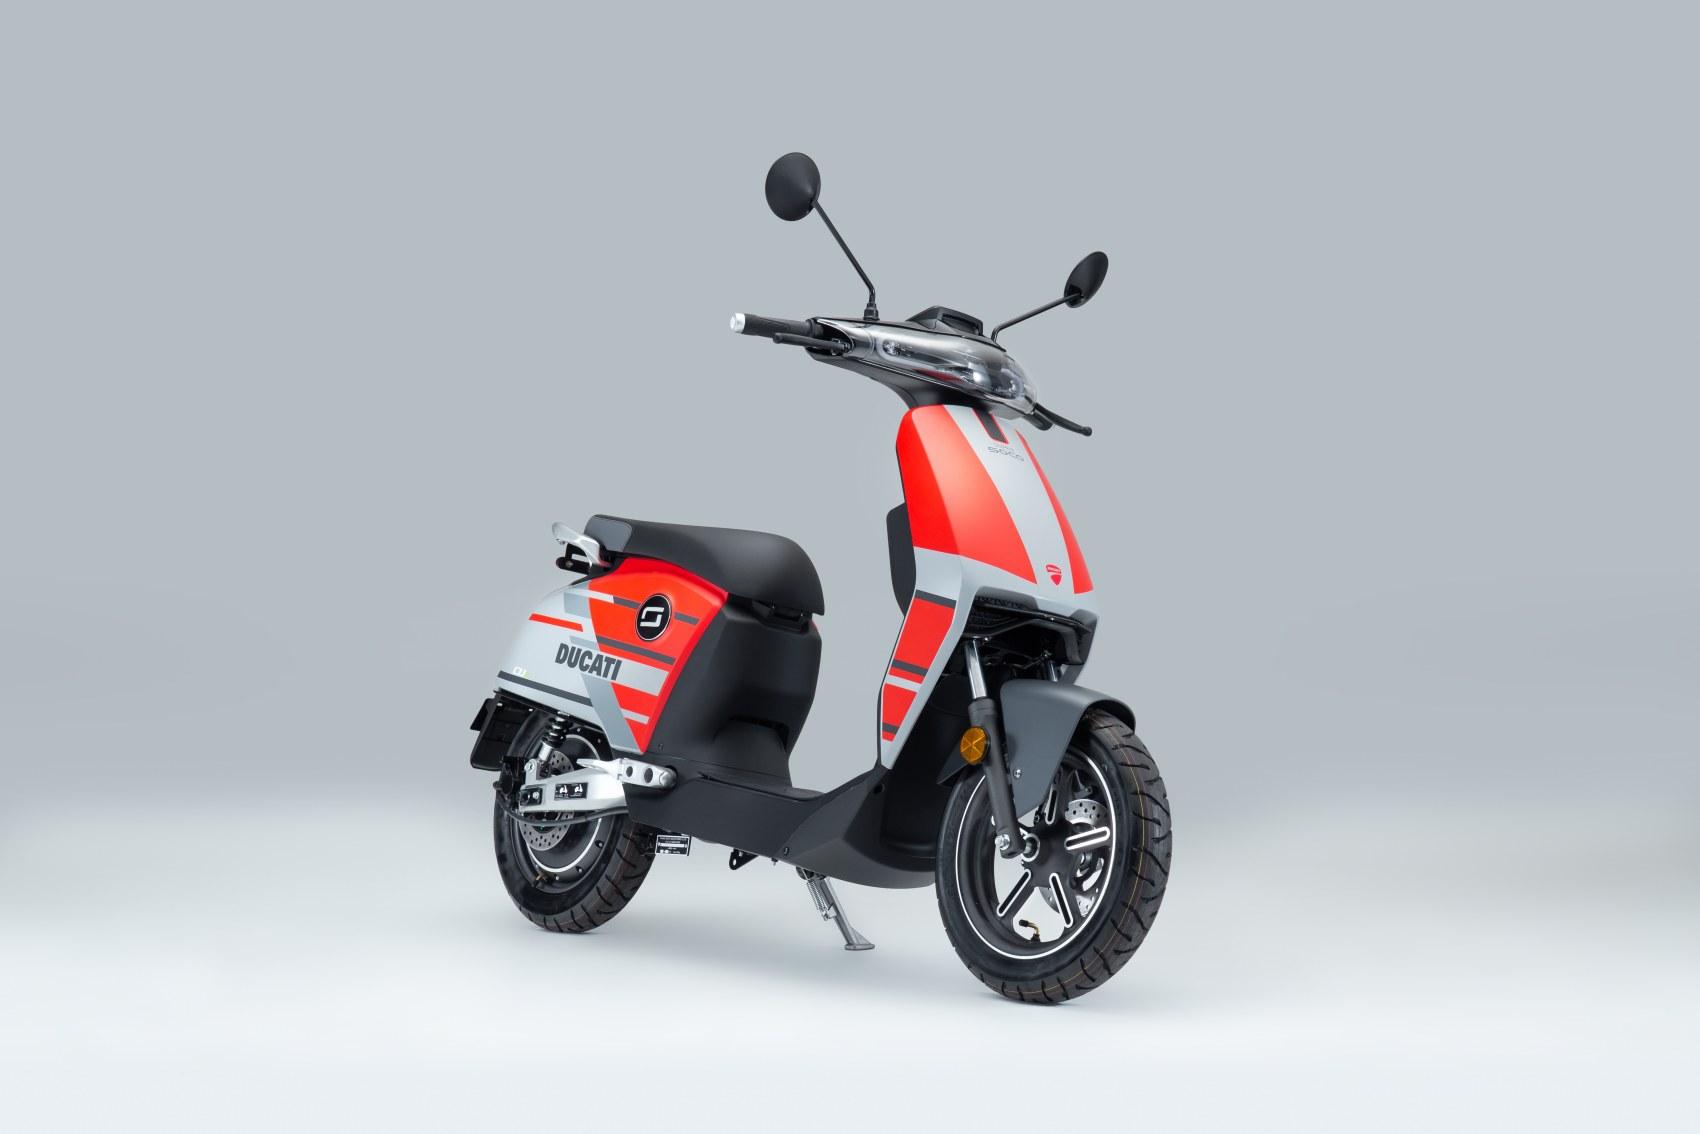 Super Soco CUx electric scooter Ducati Edition